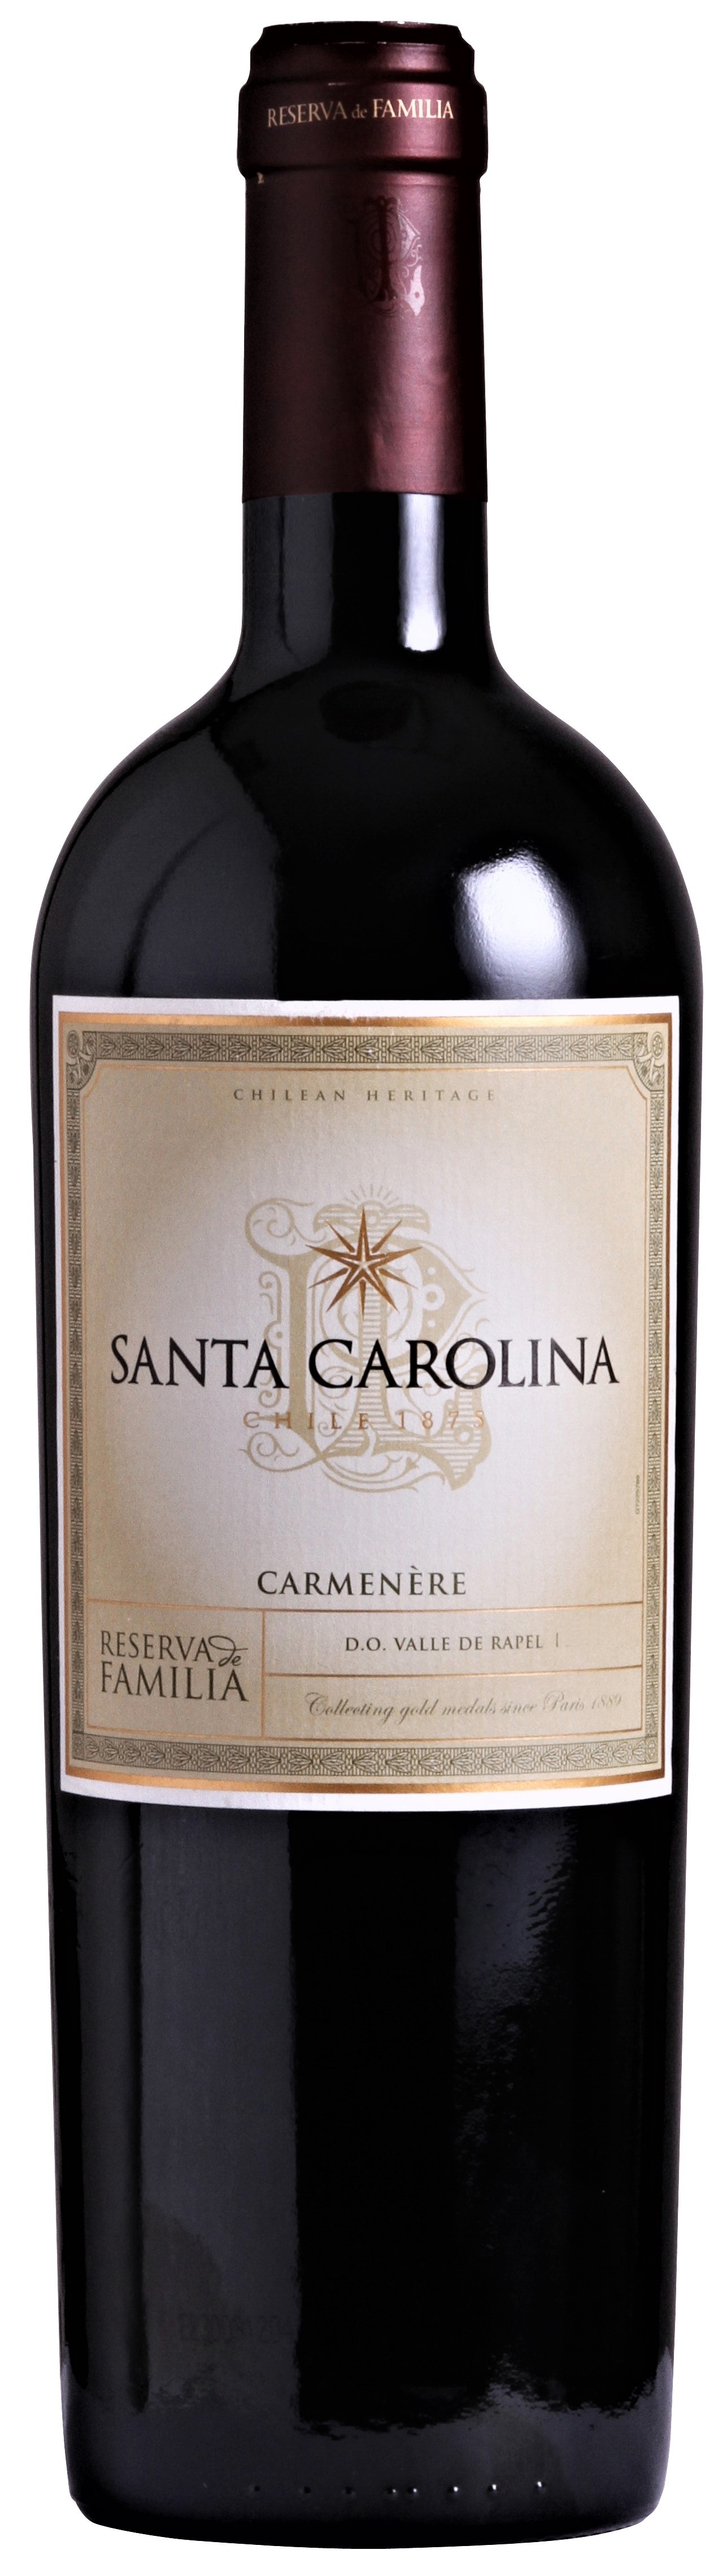 Viña Santa Carolina - 2013